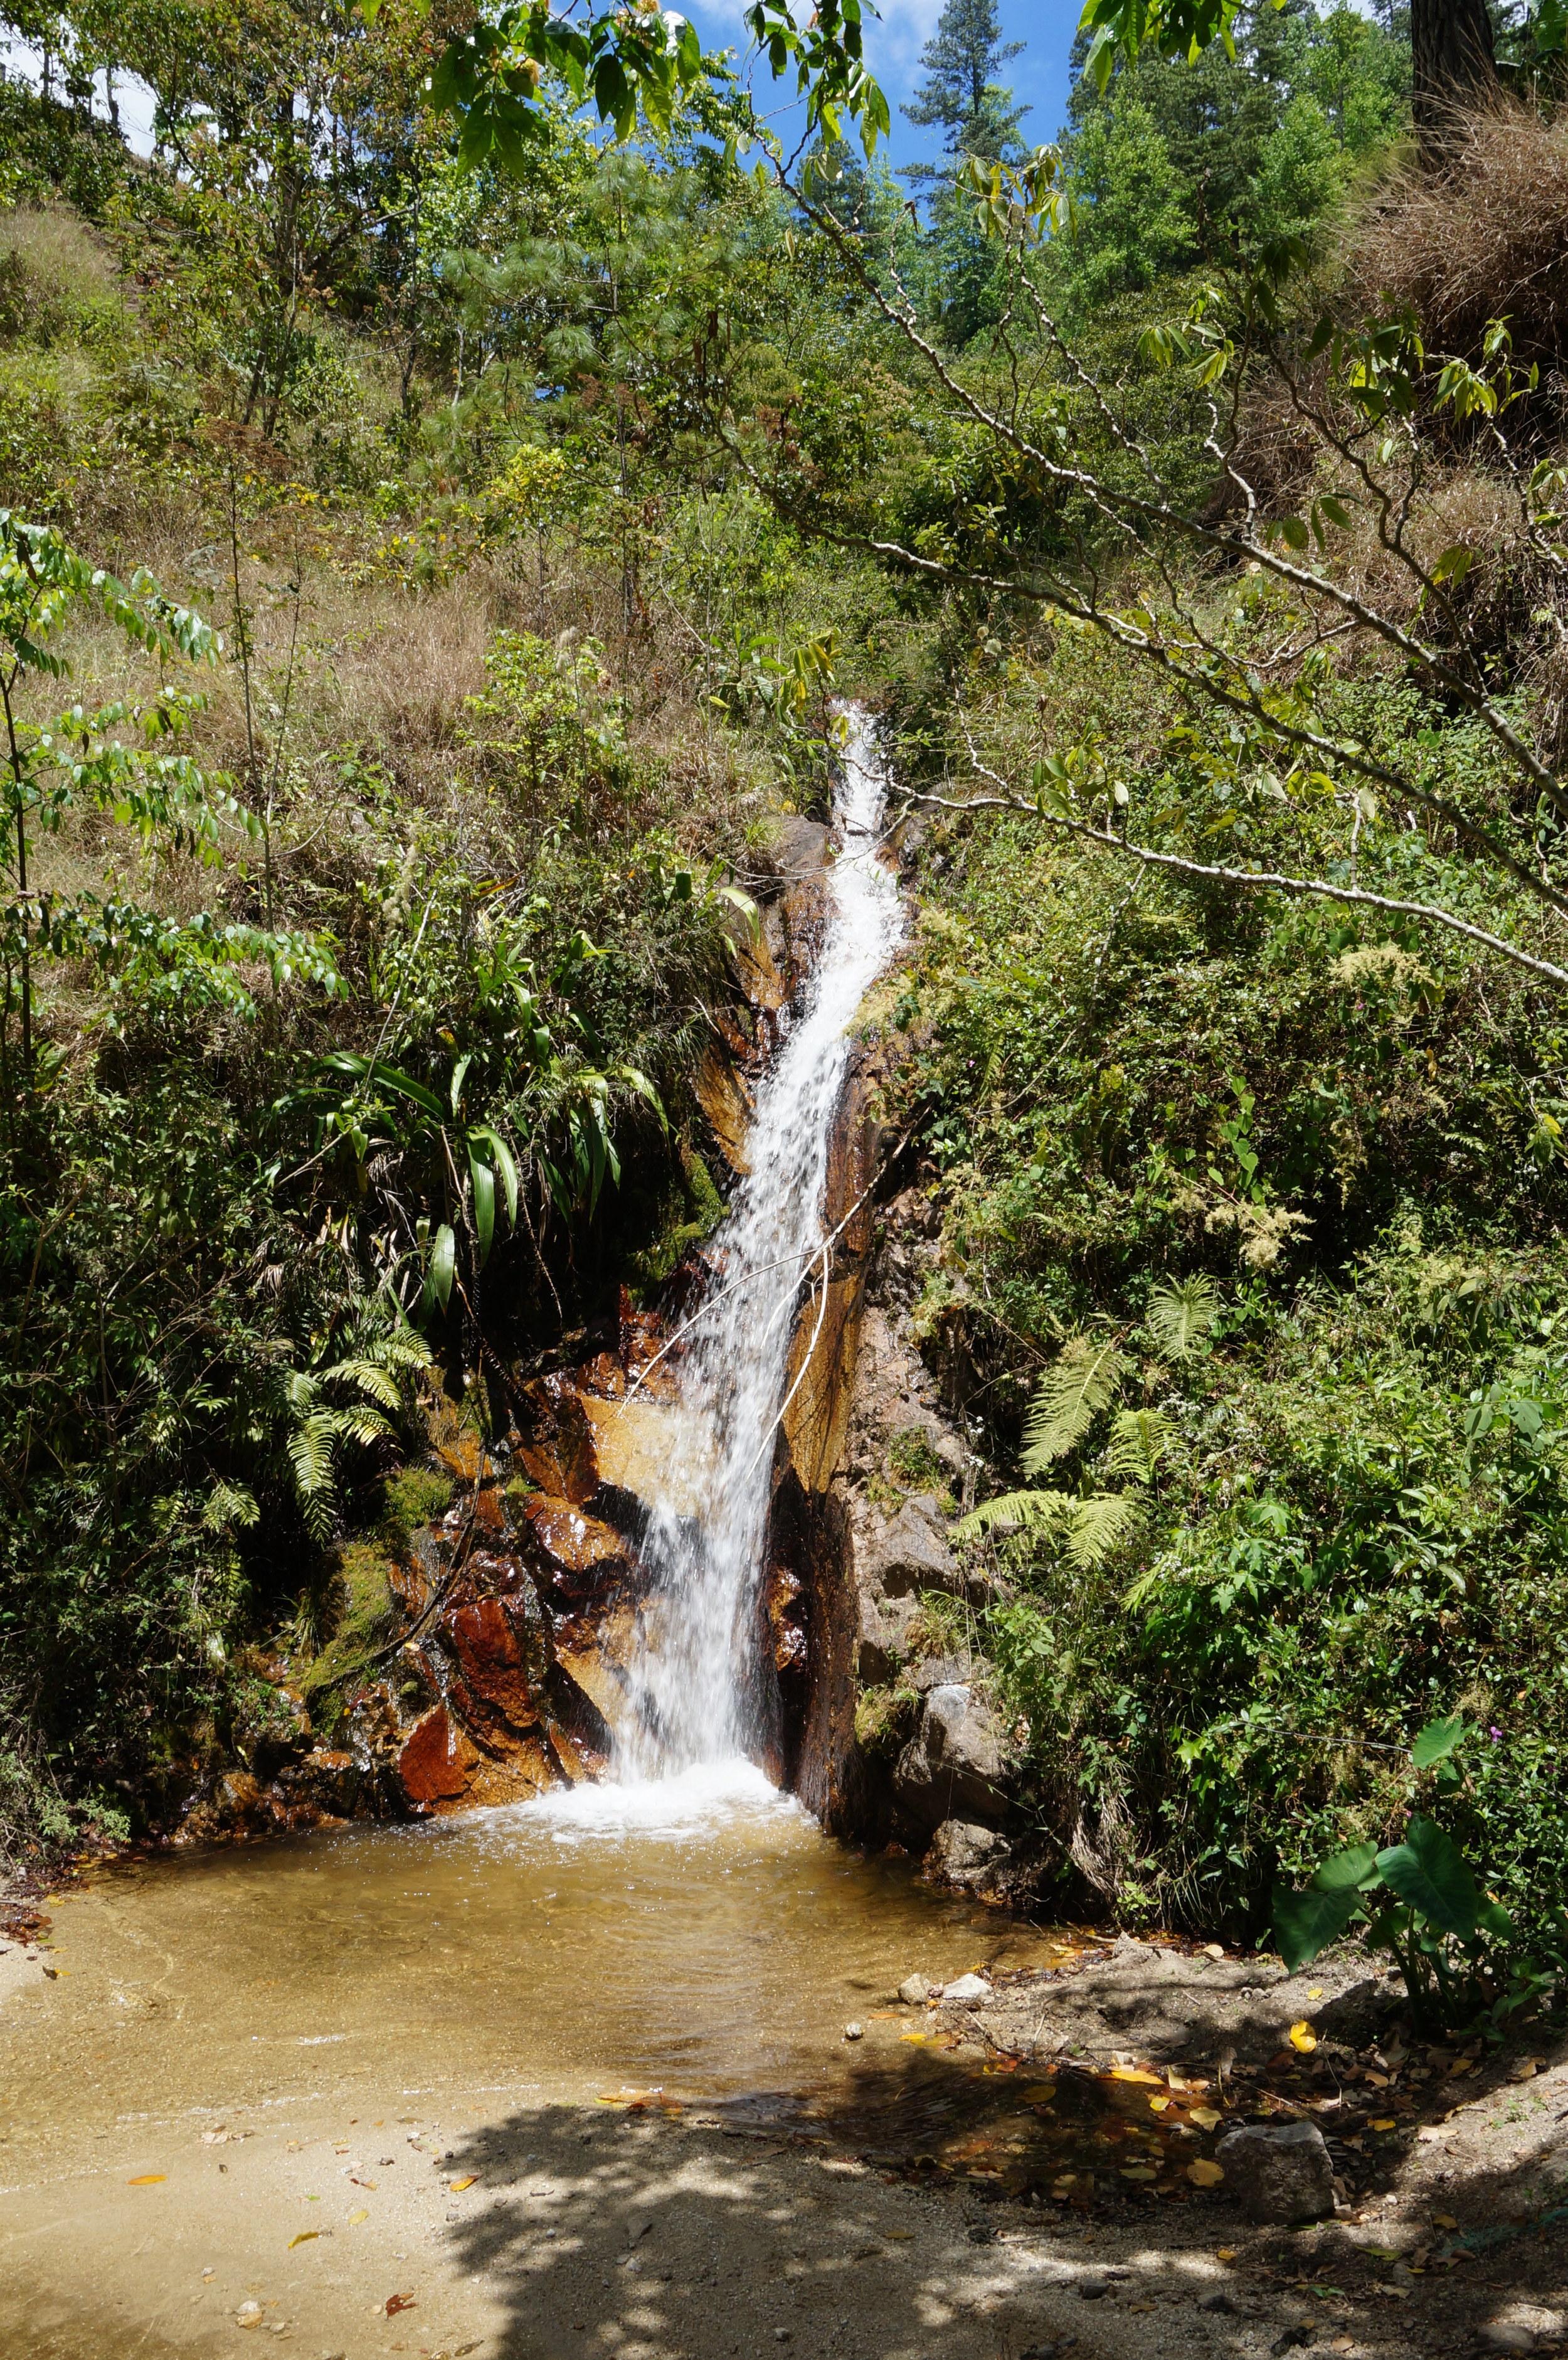 PACAMARA NATURAL (LIMITED BATCH)   COUNTRY / NICARAGUA   FARM / LOS CONGOS  VARIETY / PACAMARA  PRODUCER / JOSE RENE PAGUAGA  FLAVOR NOTES / LEMON, TANGERINE, MANGO, STAR FRUIT, STRAWBERRY, BLACKBERRY